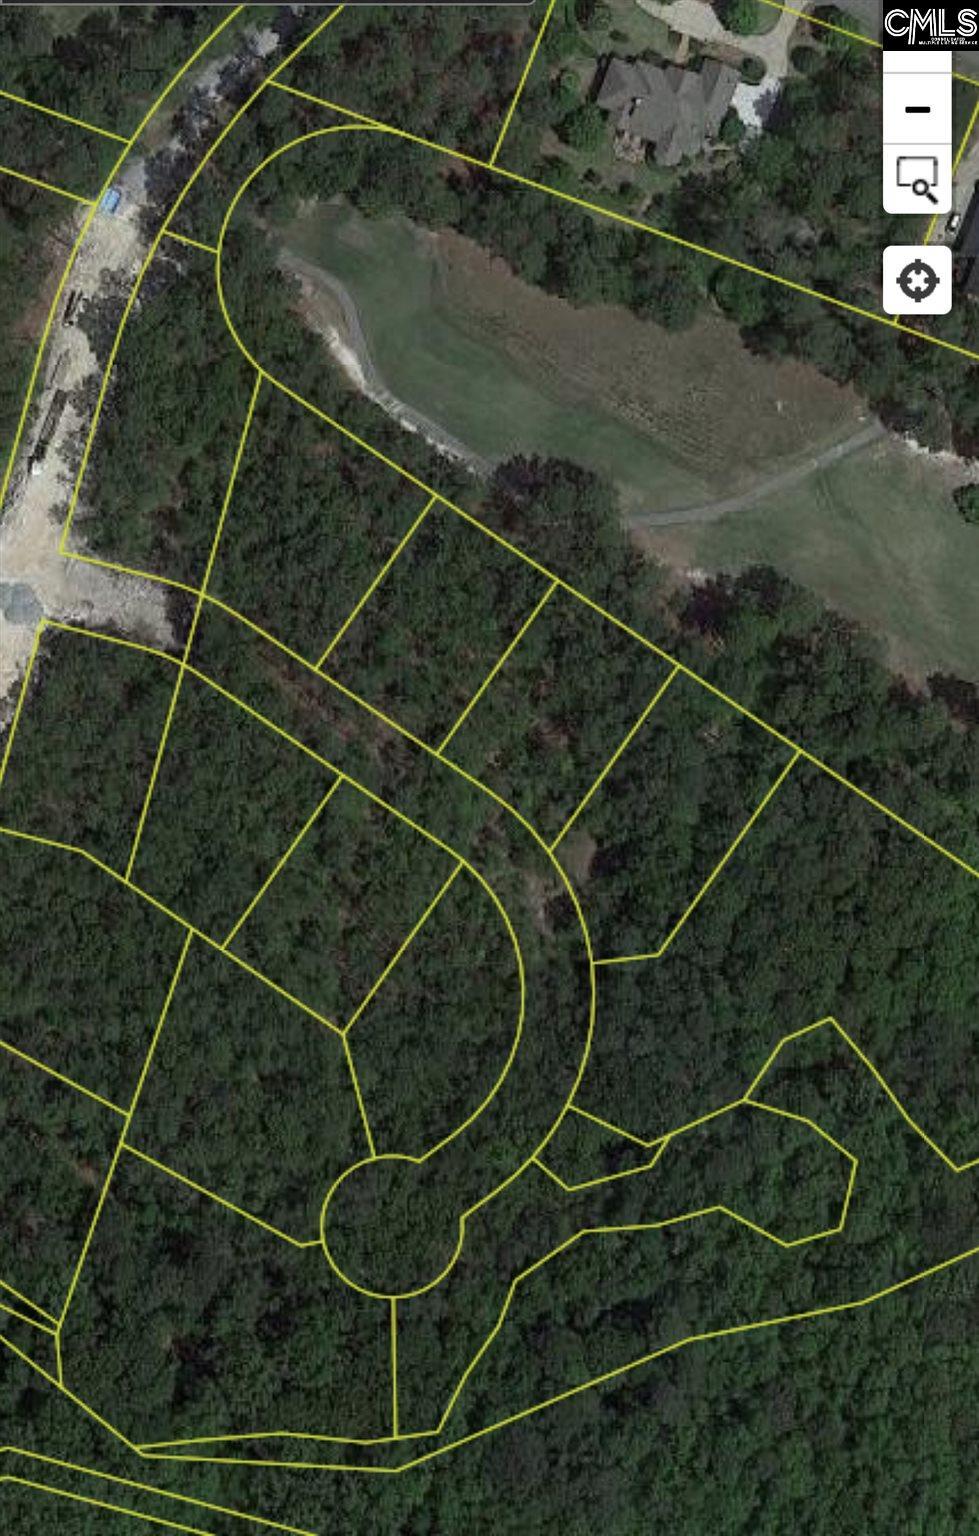 362 E Arrowleaf Drive (lot 26) Elgin, SC 29045